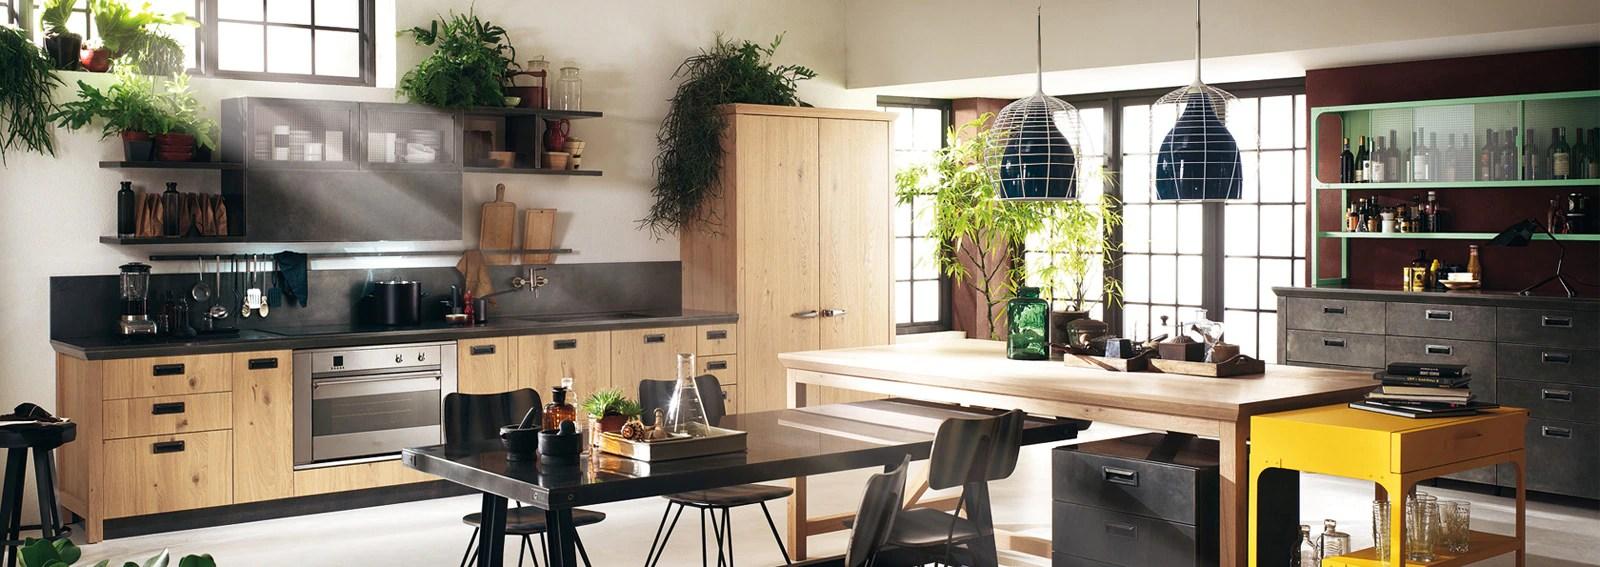 Stile industriale le cucine pi belle  Graziait